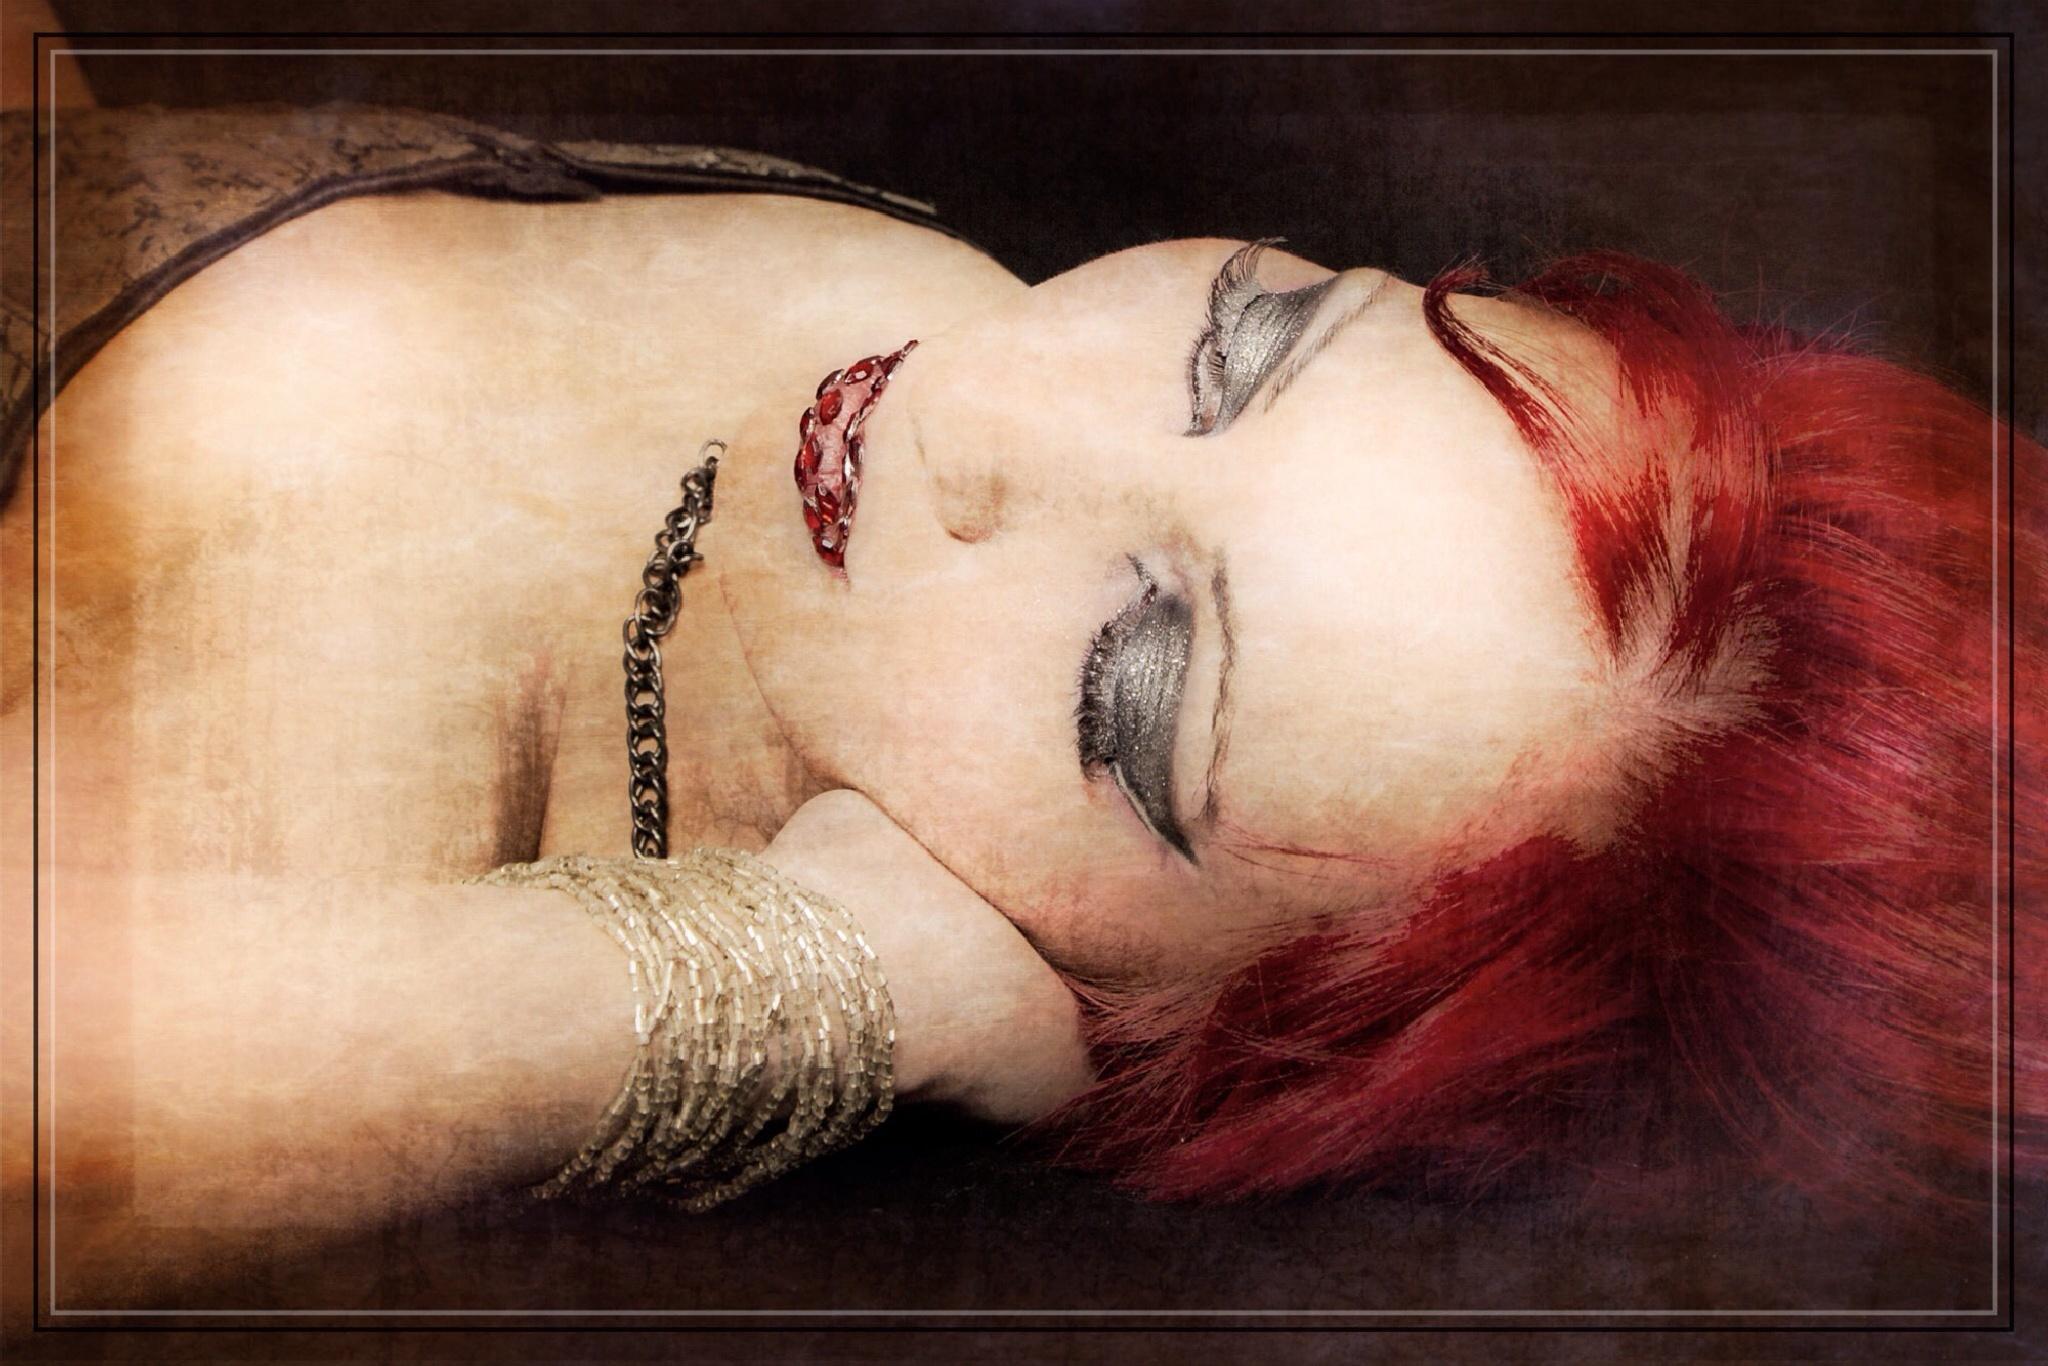 Beautiful girl by Stephen Johnson Photography